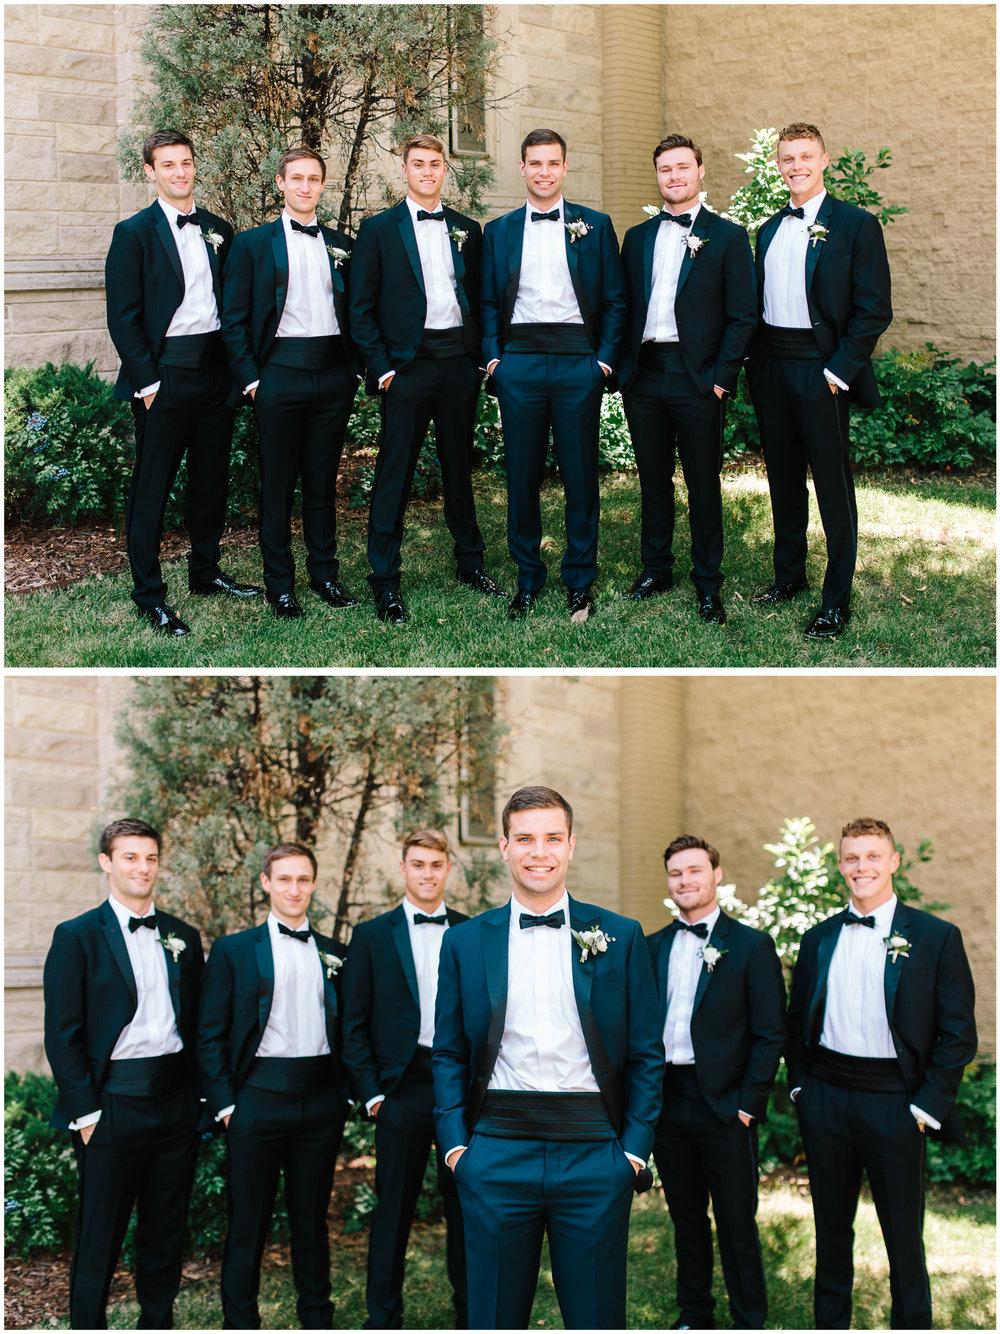 JW_Marriott_Wedding_39.jpg